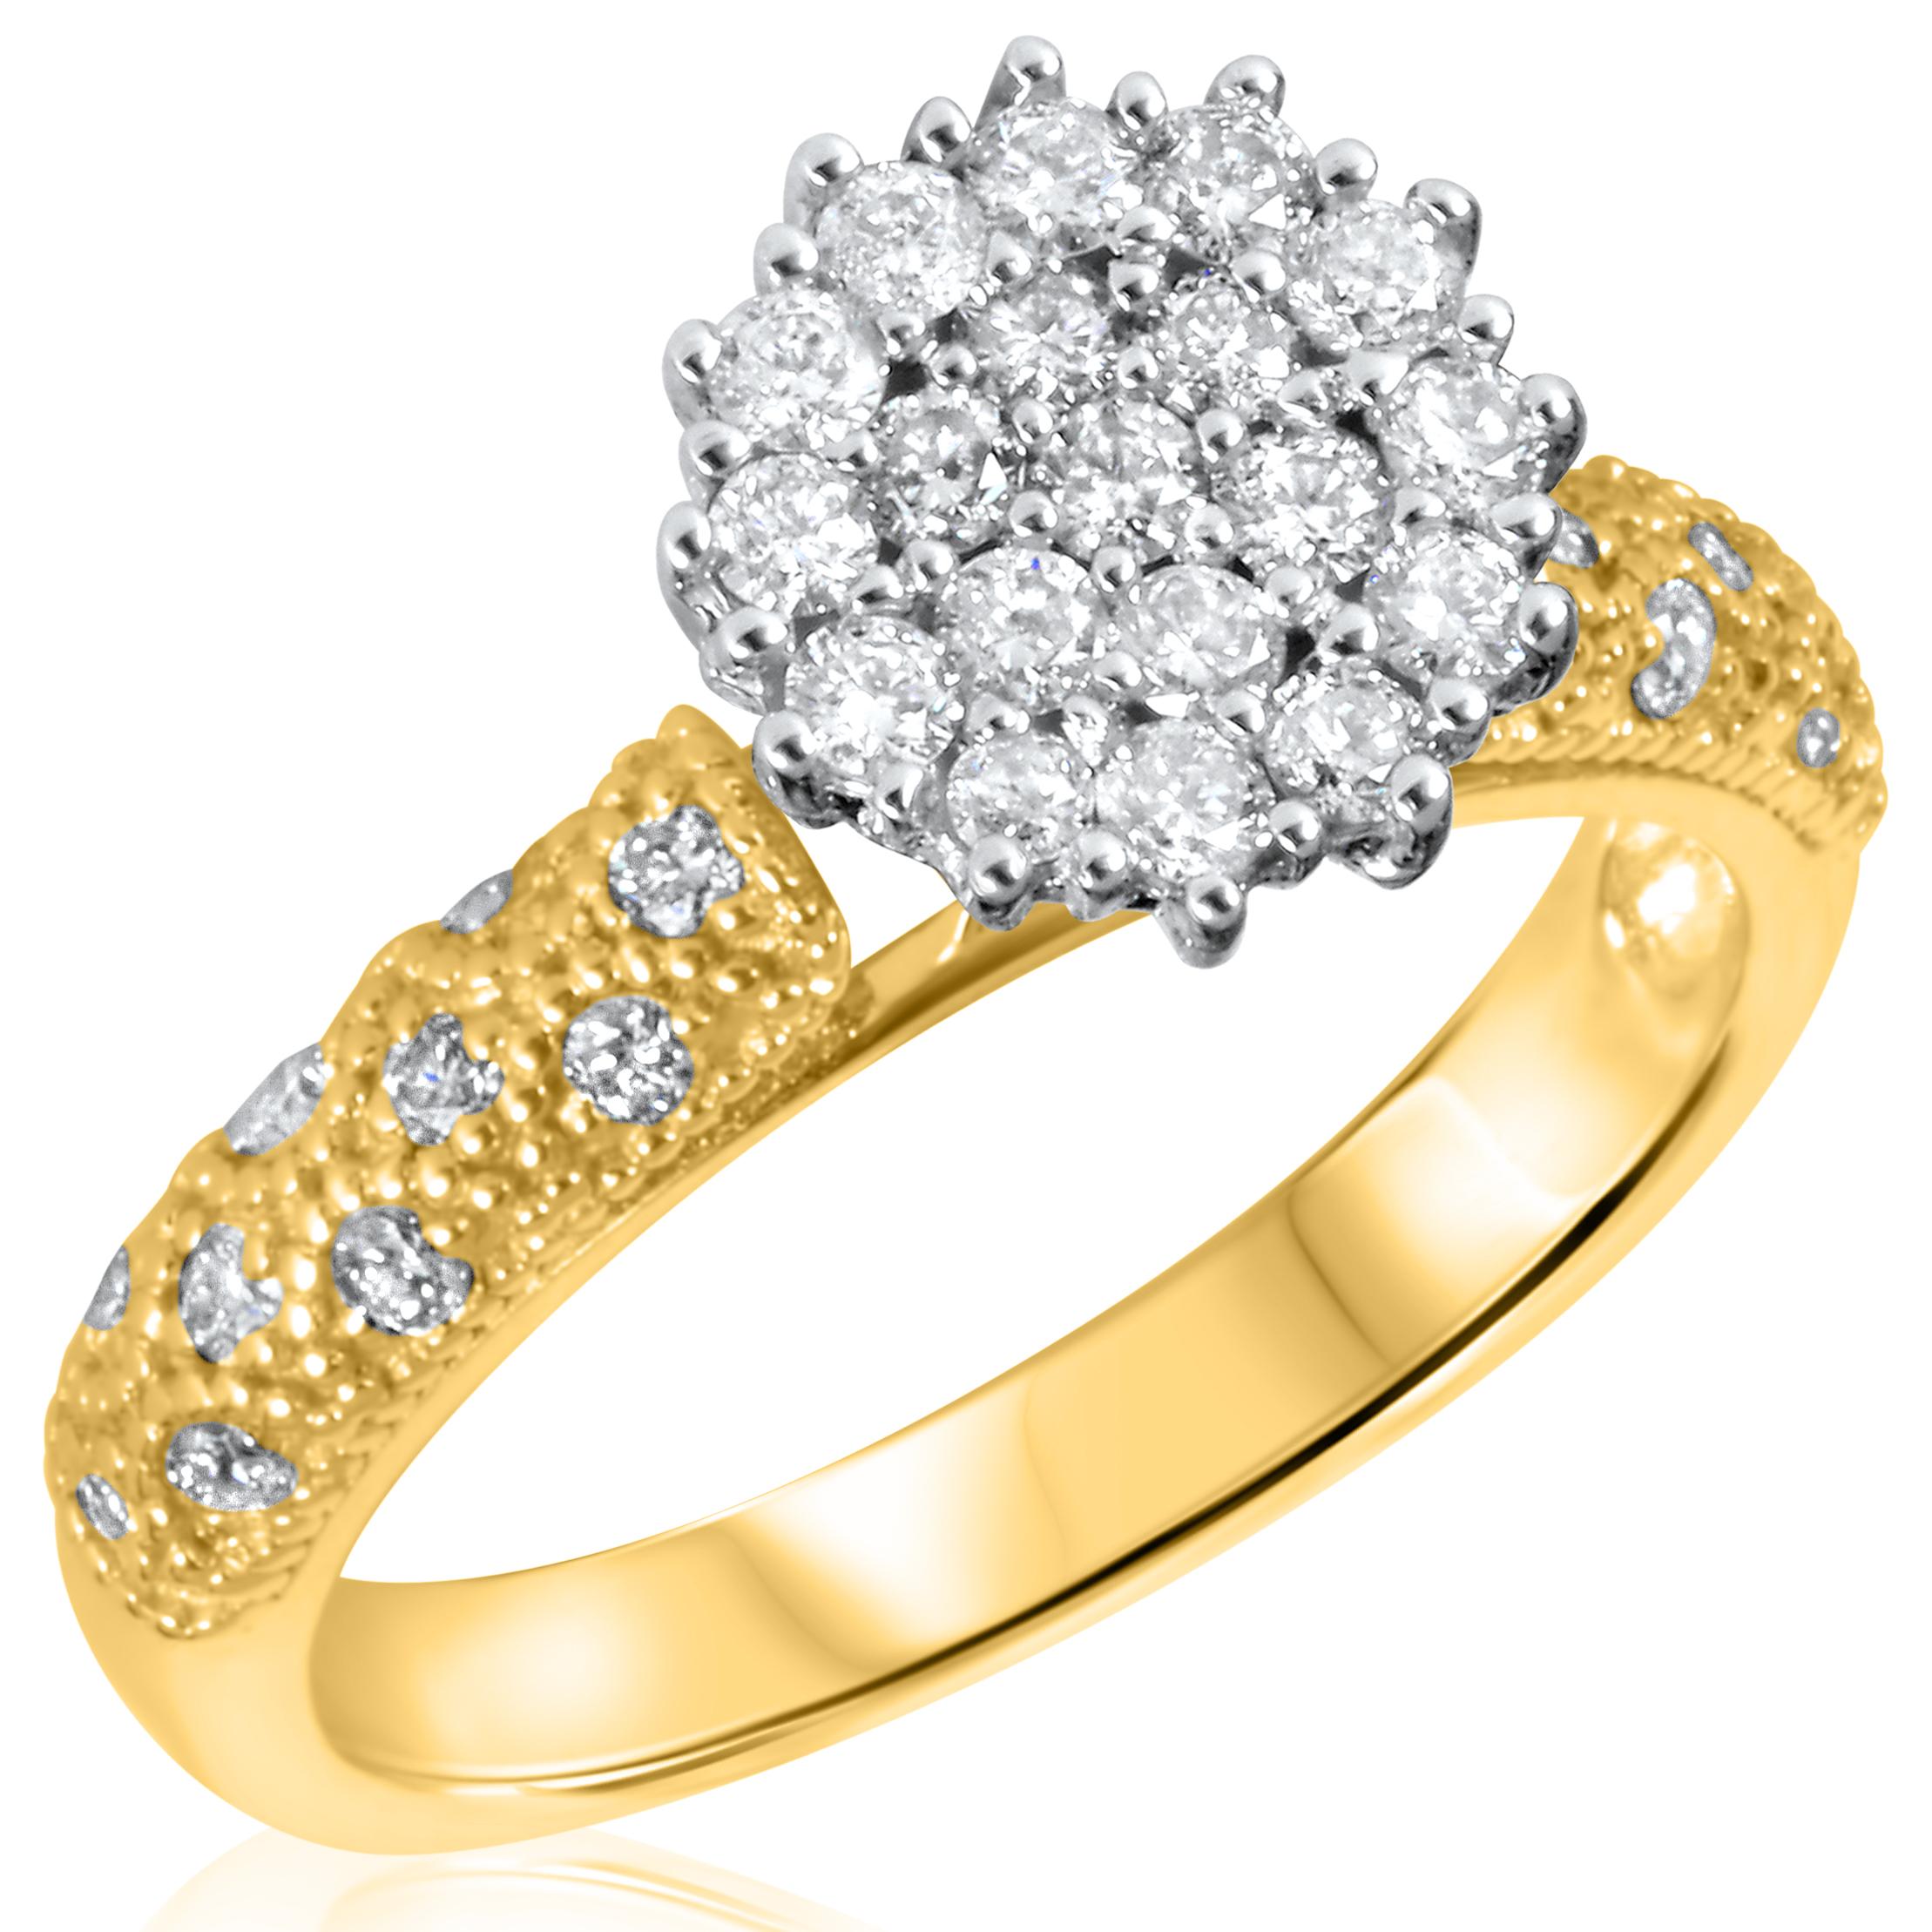 2/3 Carat T.W. Round Cut Diamond Ladies Engagement Ring 14K Yellow Gold- Size 8